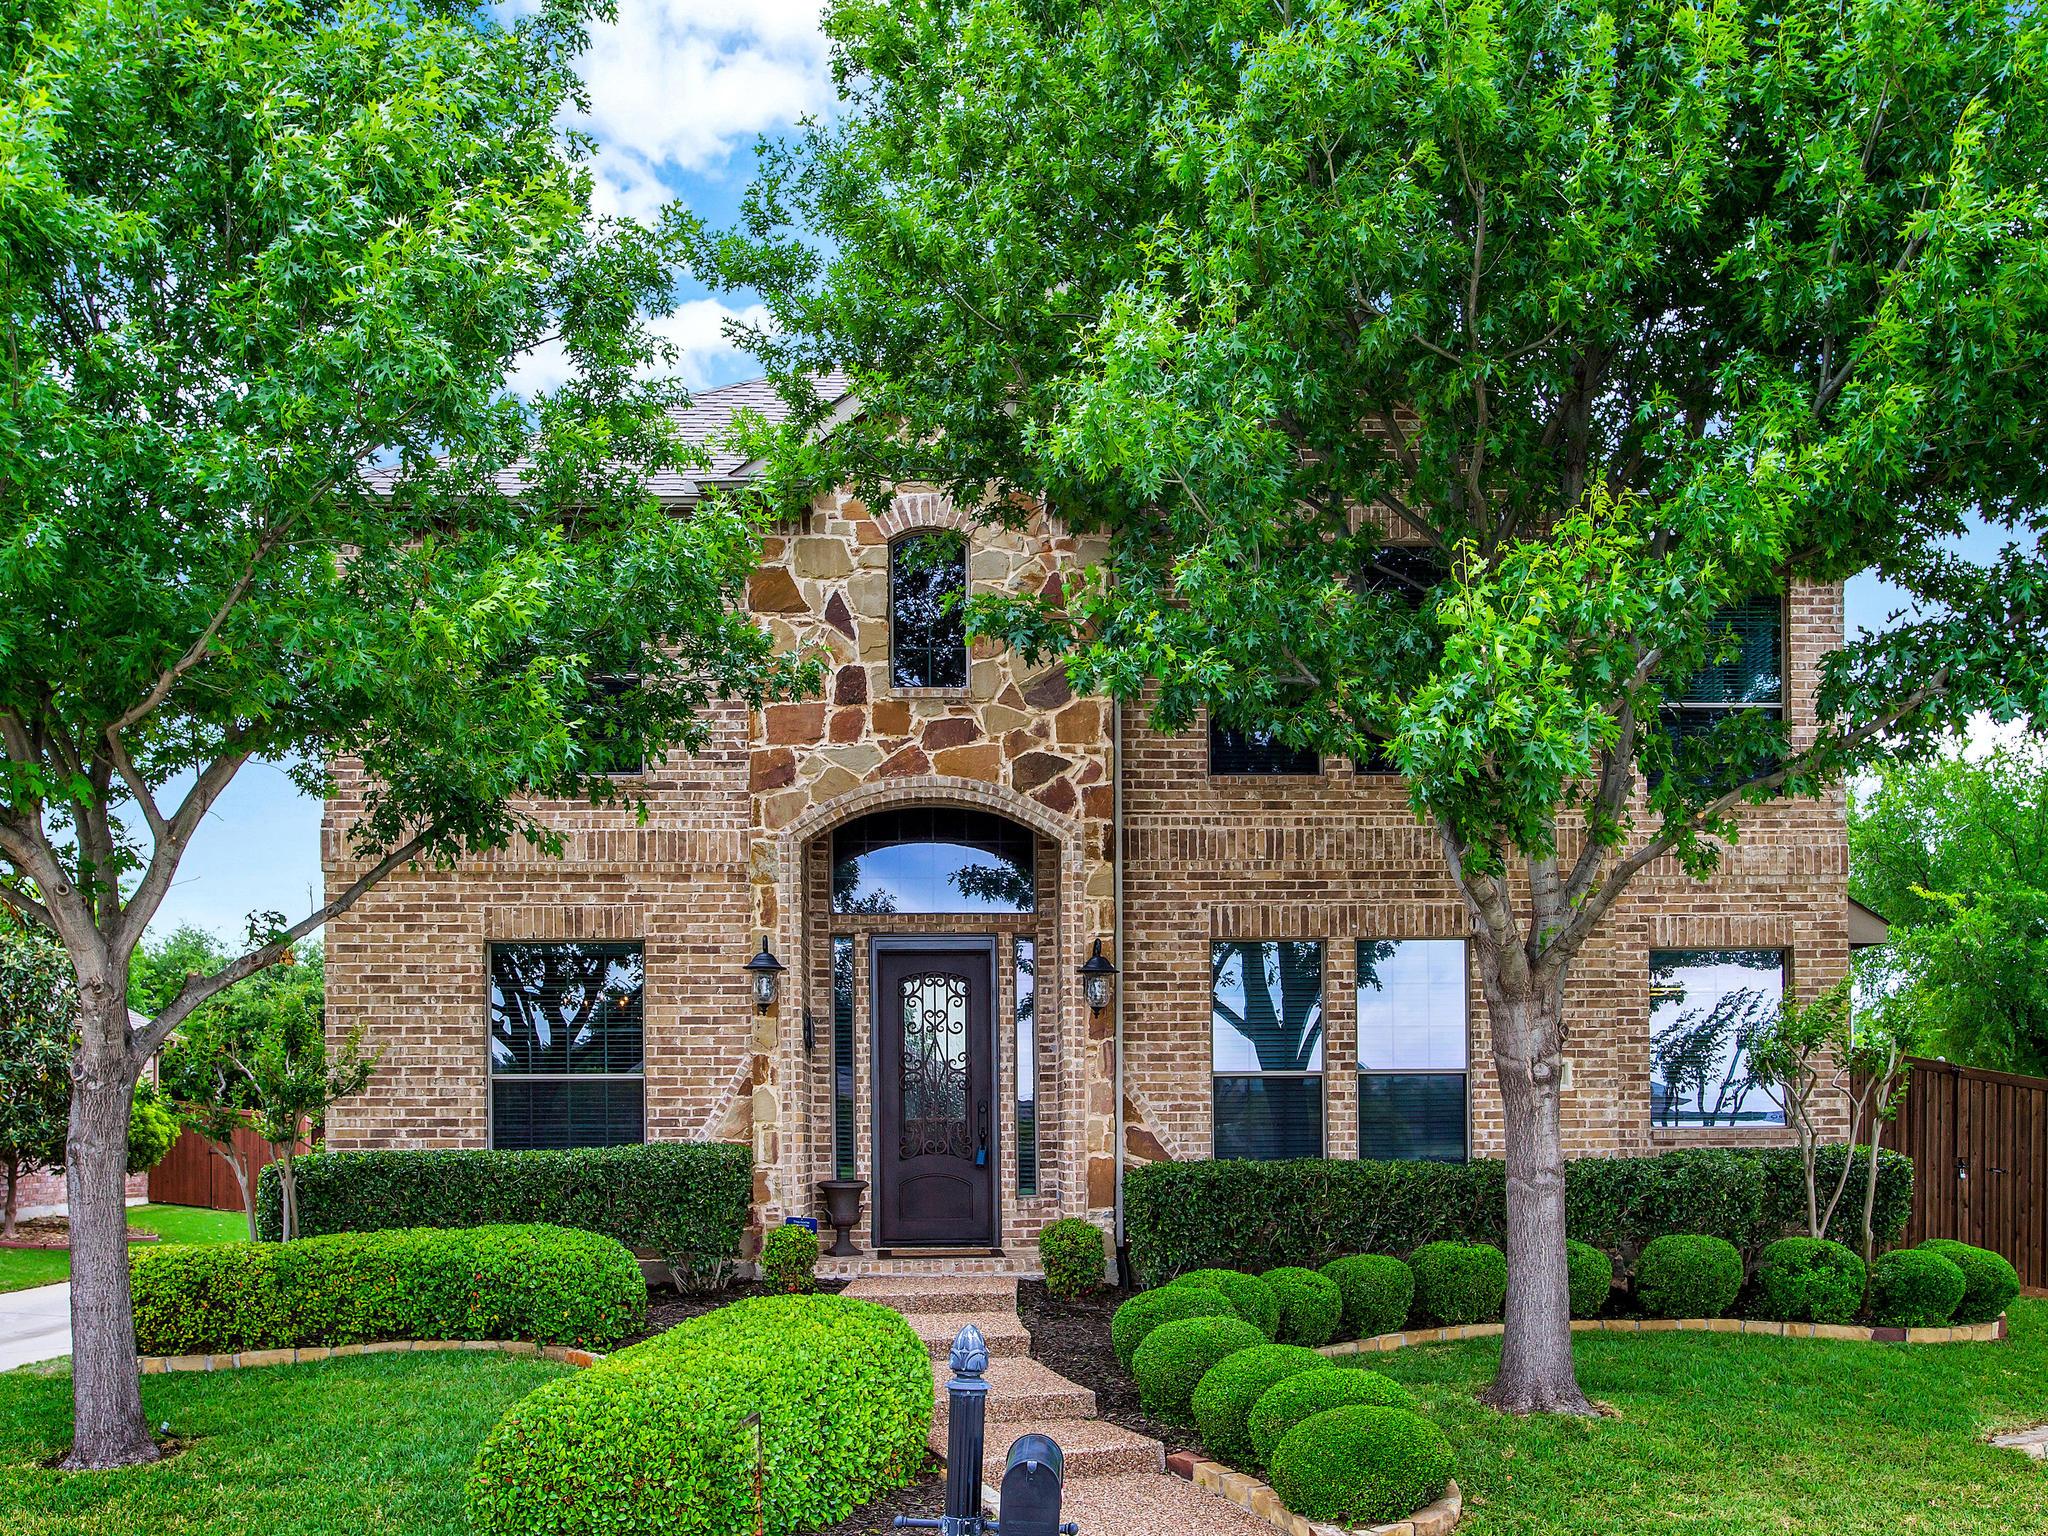 Homes for Sale in Allen, TX - 1437 Lampasas Dr, Allen, TX 75013